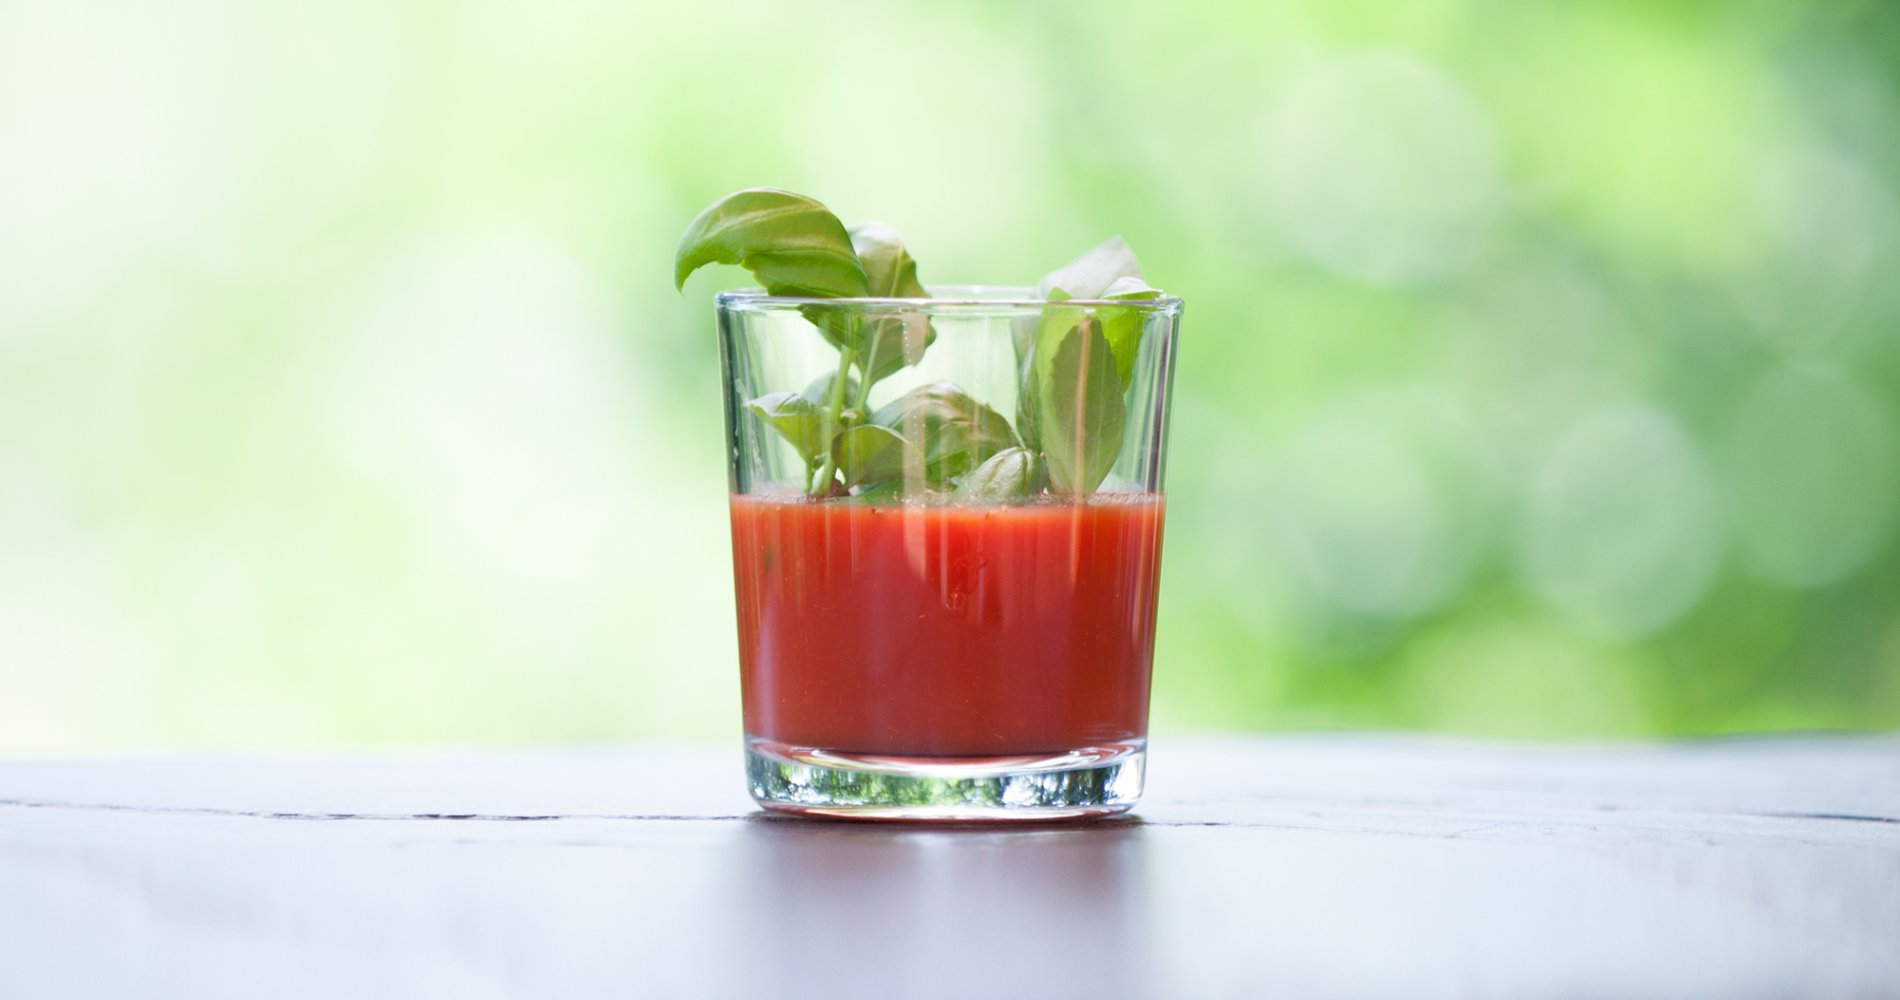 Low Carb: Tomatensaft mit Basilikum - würzige Abwechslung